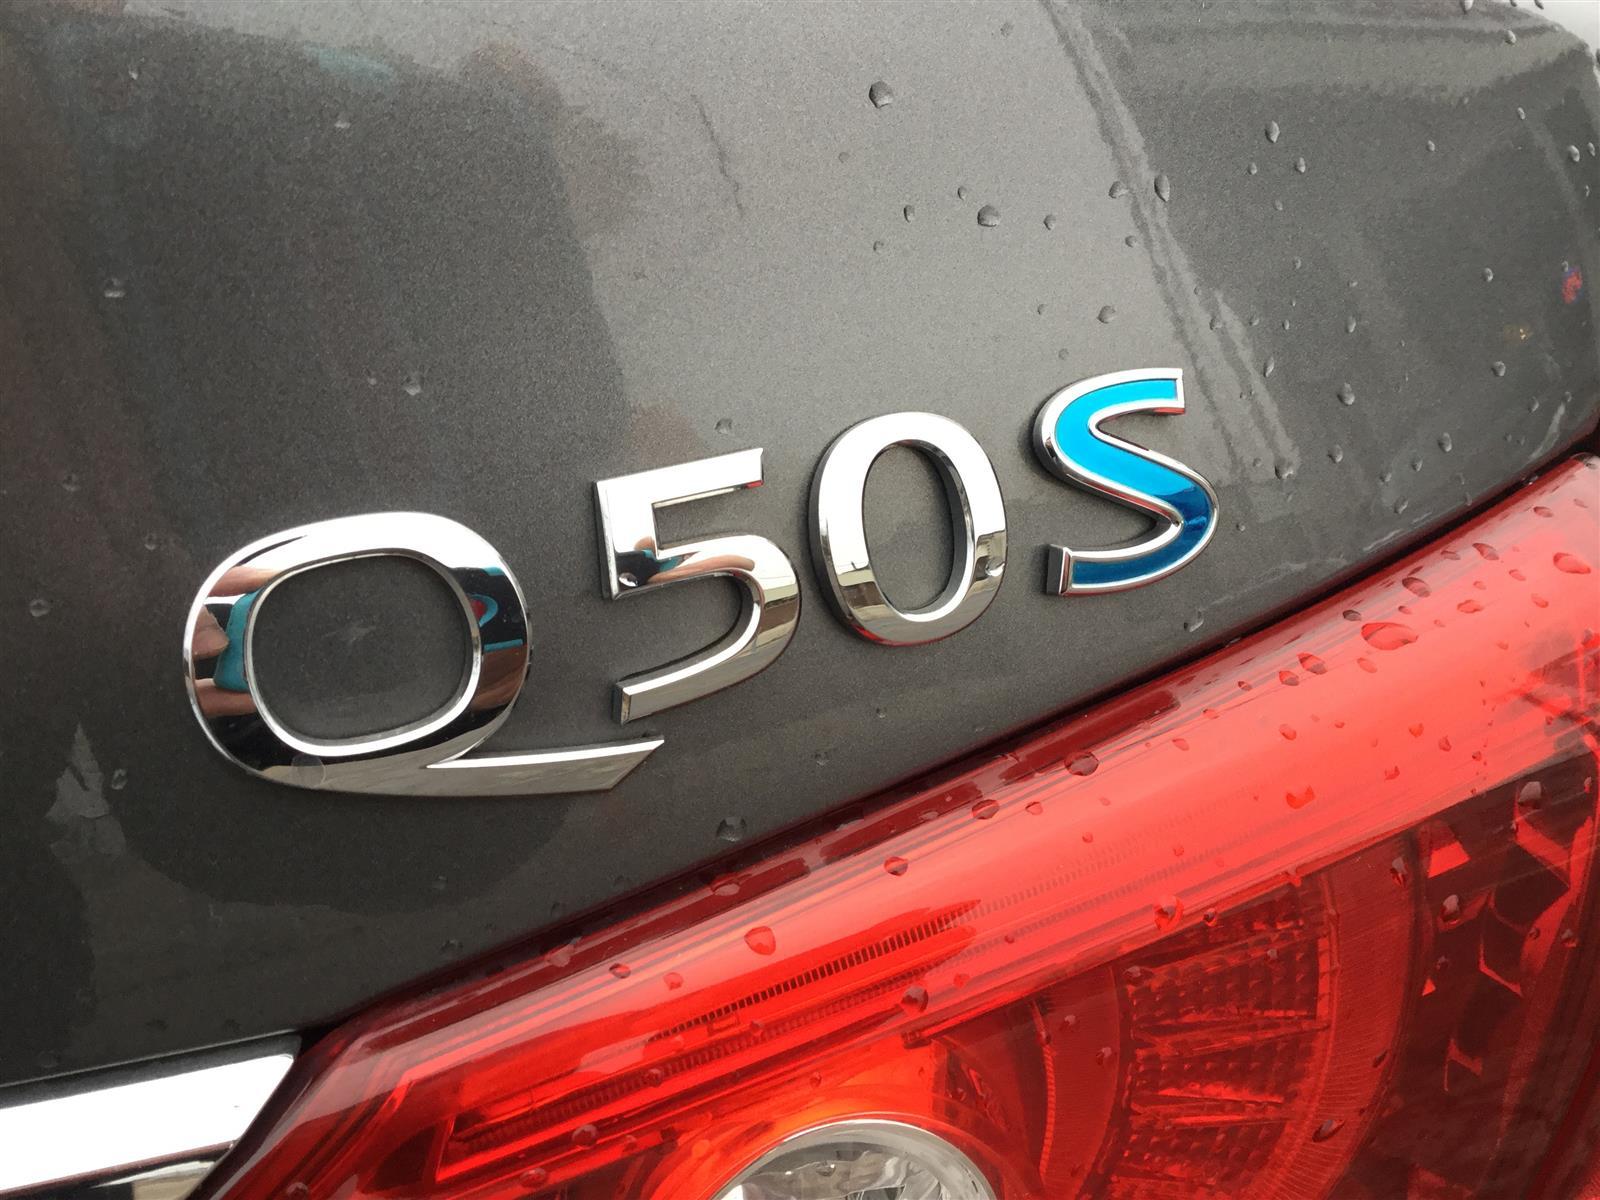 Used 2015 Infiniti Q50 in Oakville,ON